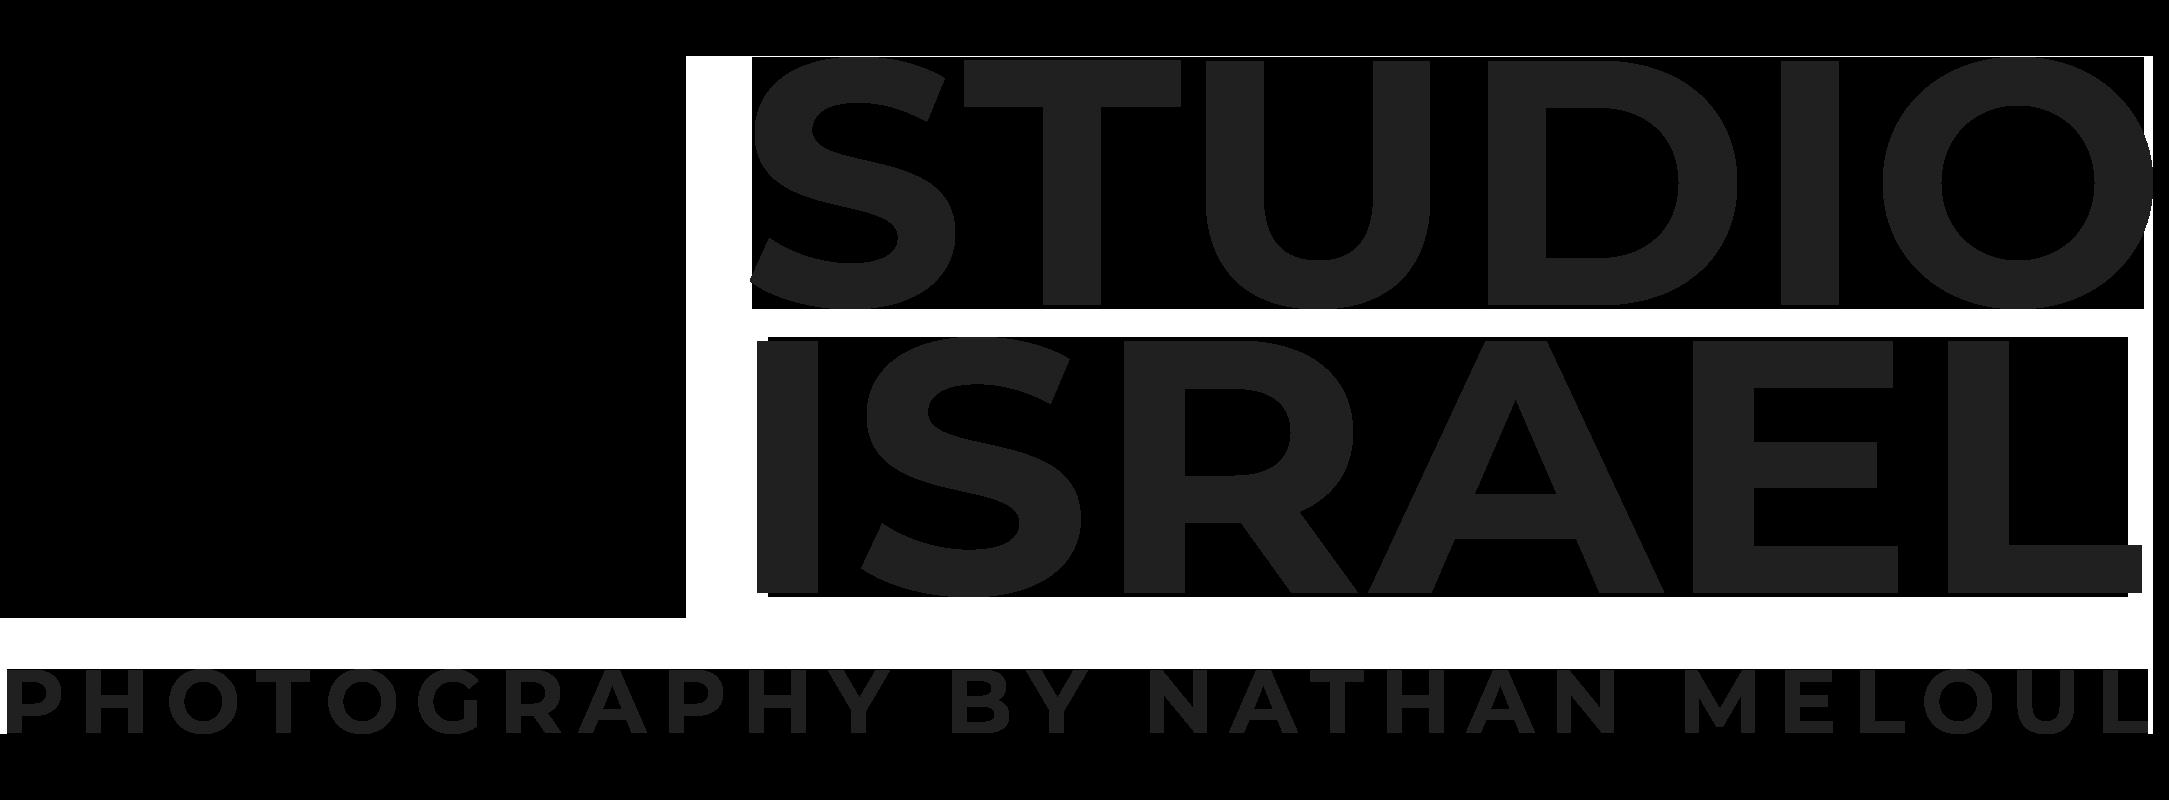 Studio Israel - Nathan Meloul Photography